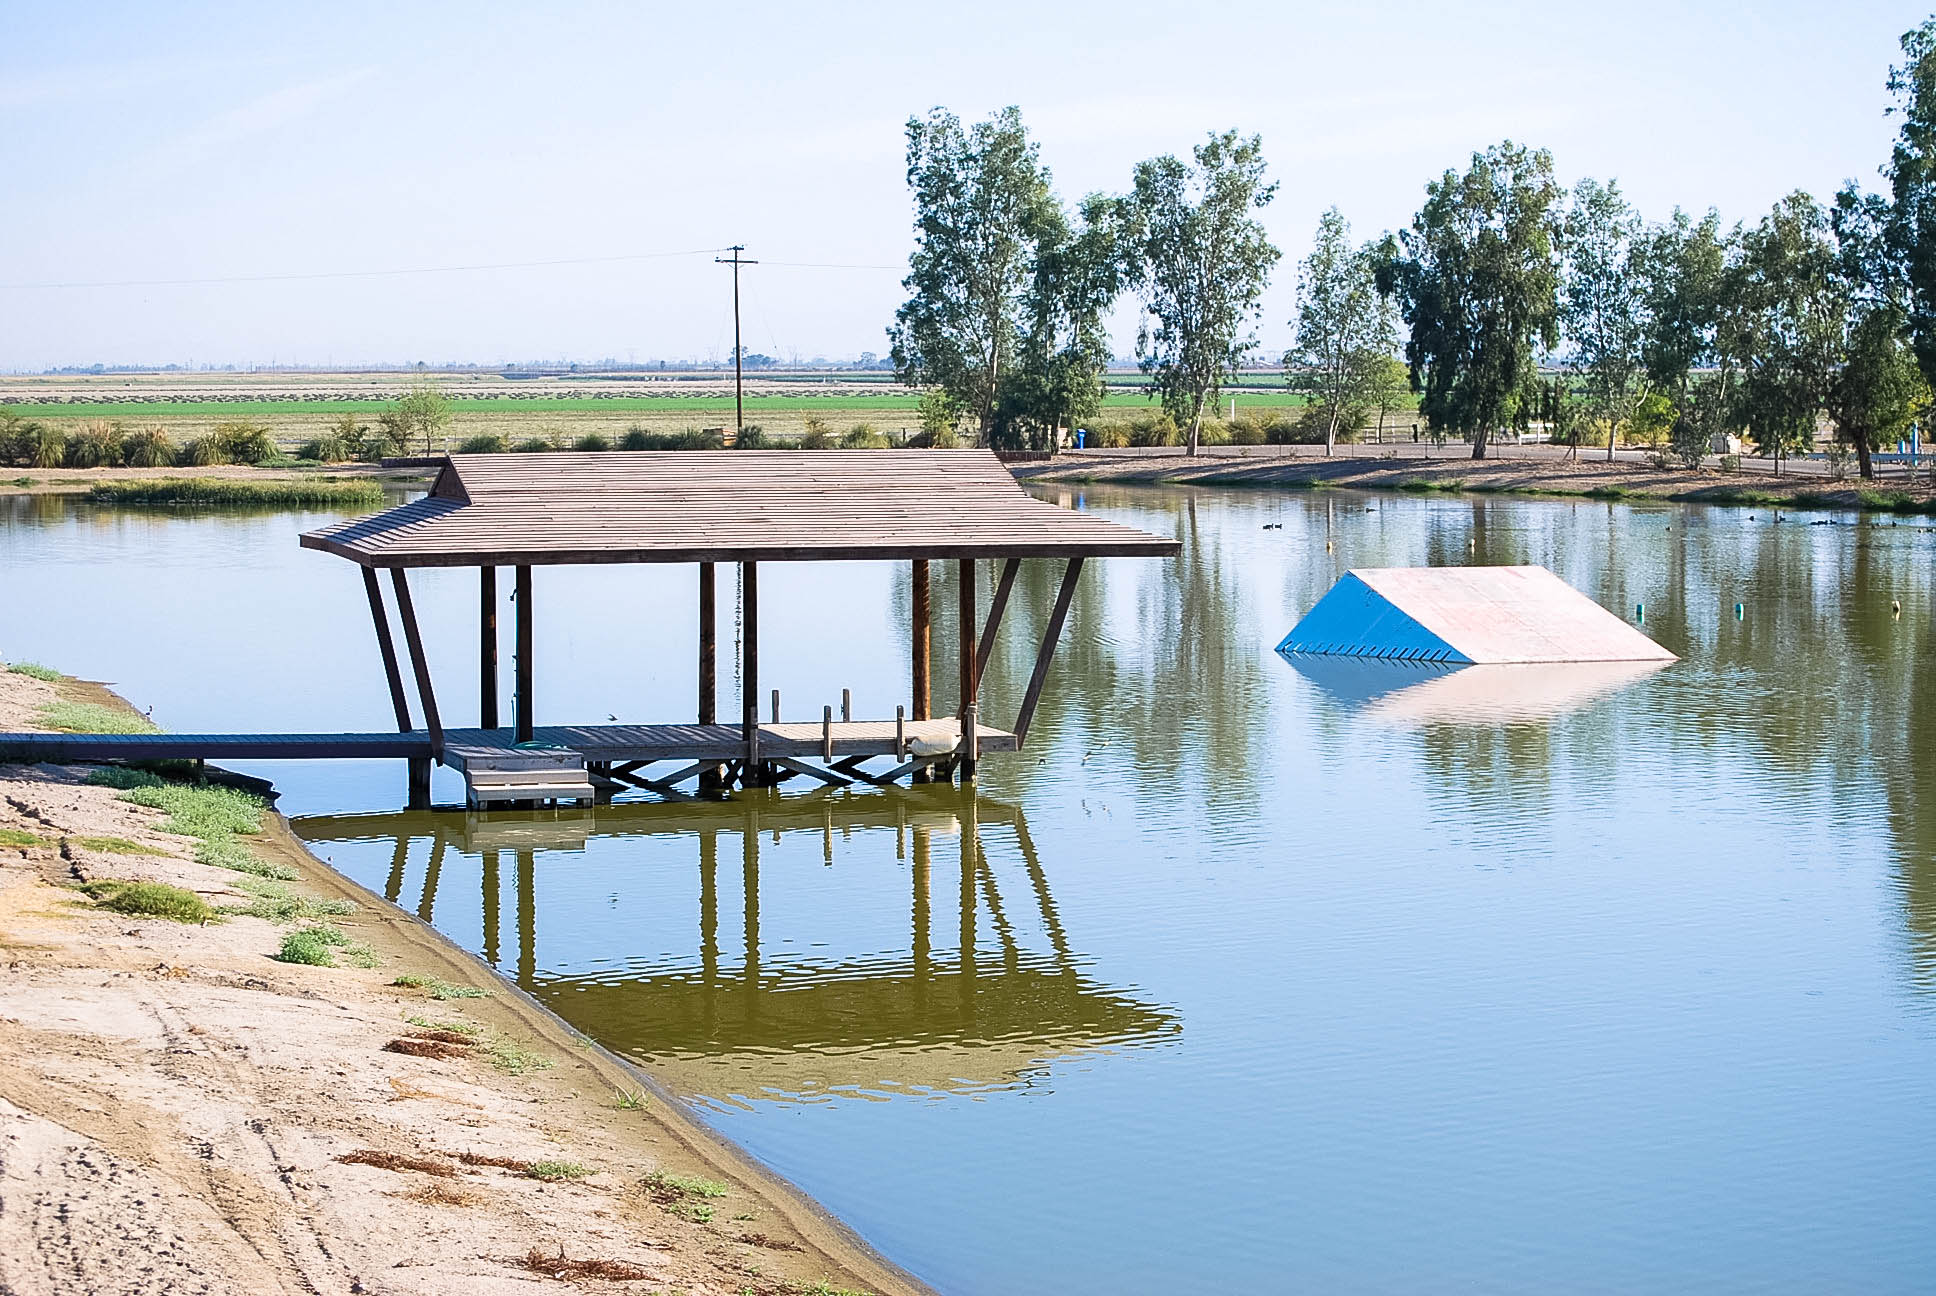 ironwood-ranch-lakes-34.jpg